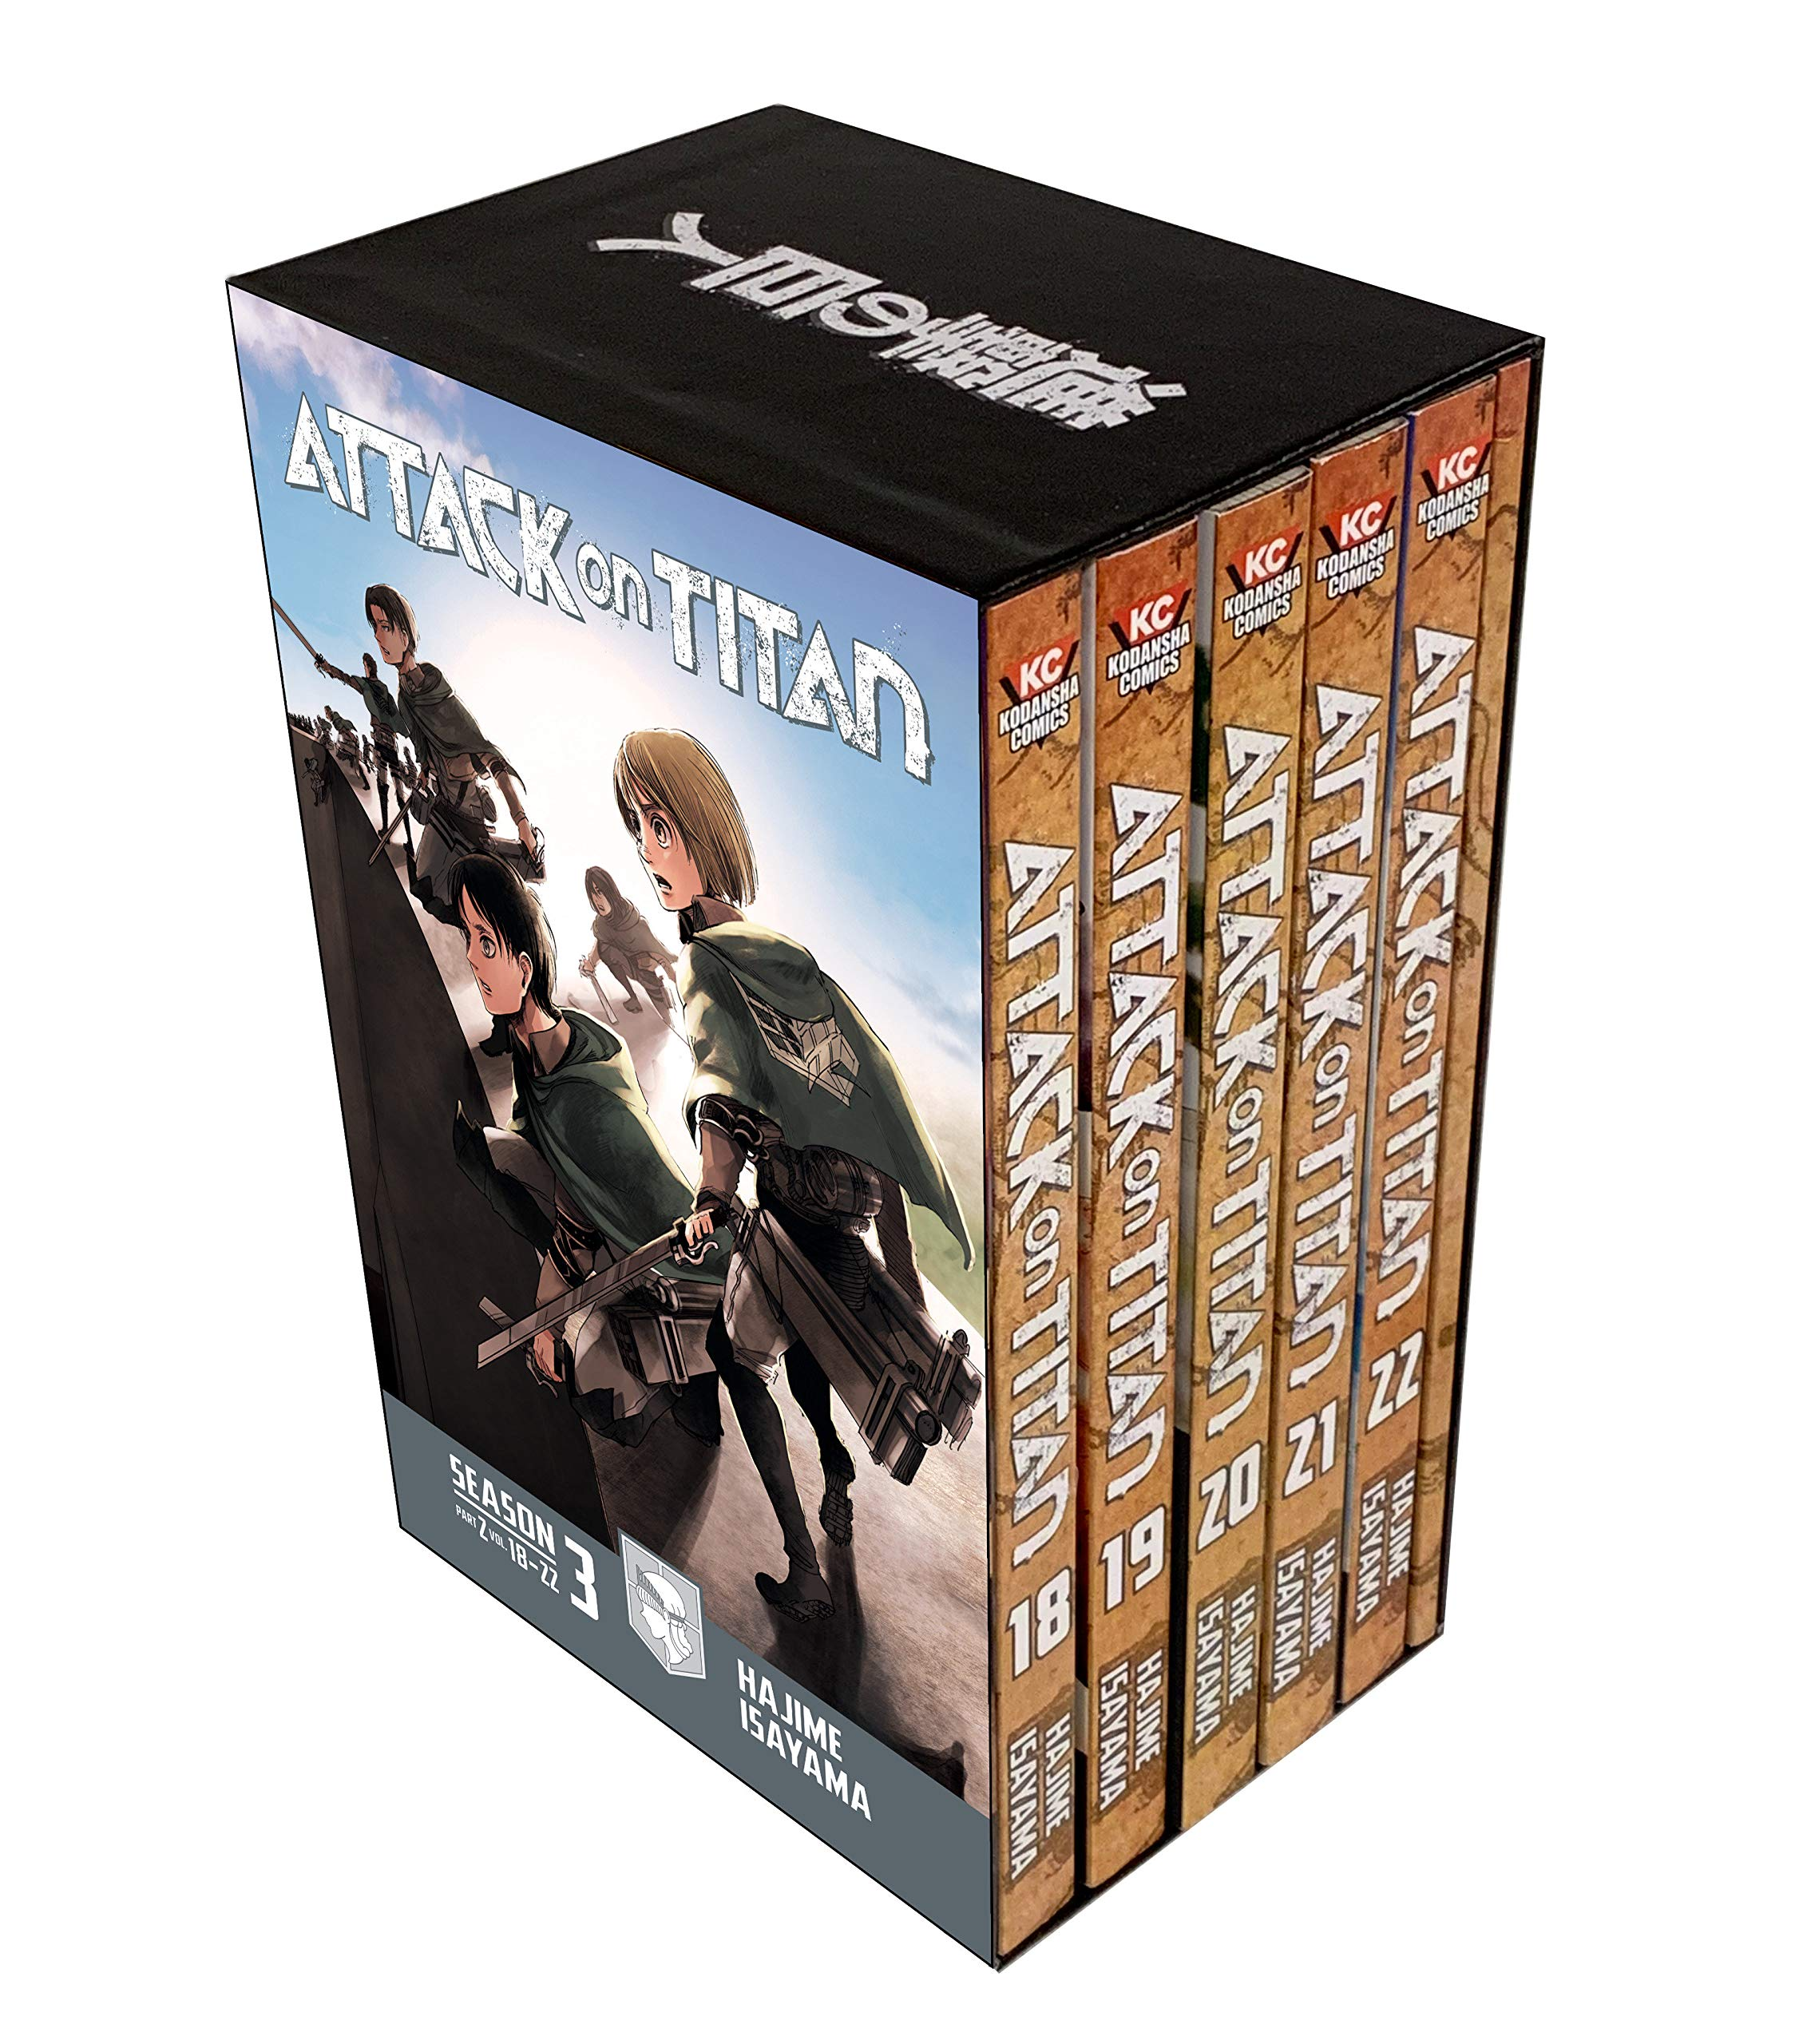 Attack on Titan Season 3 Part 2 Manga Box Set: Amazon.es: Isayama, Hajime: Libros en idiomas extranjeros